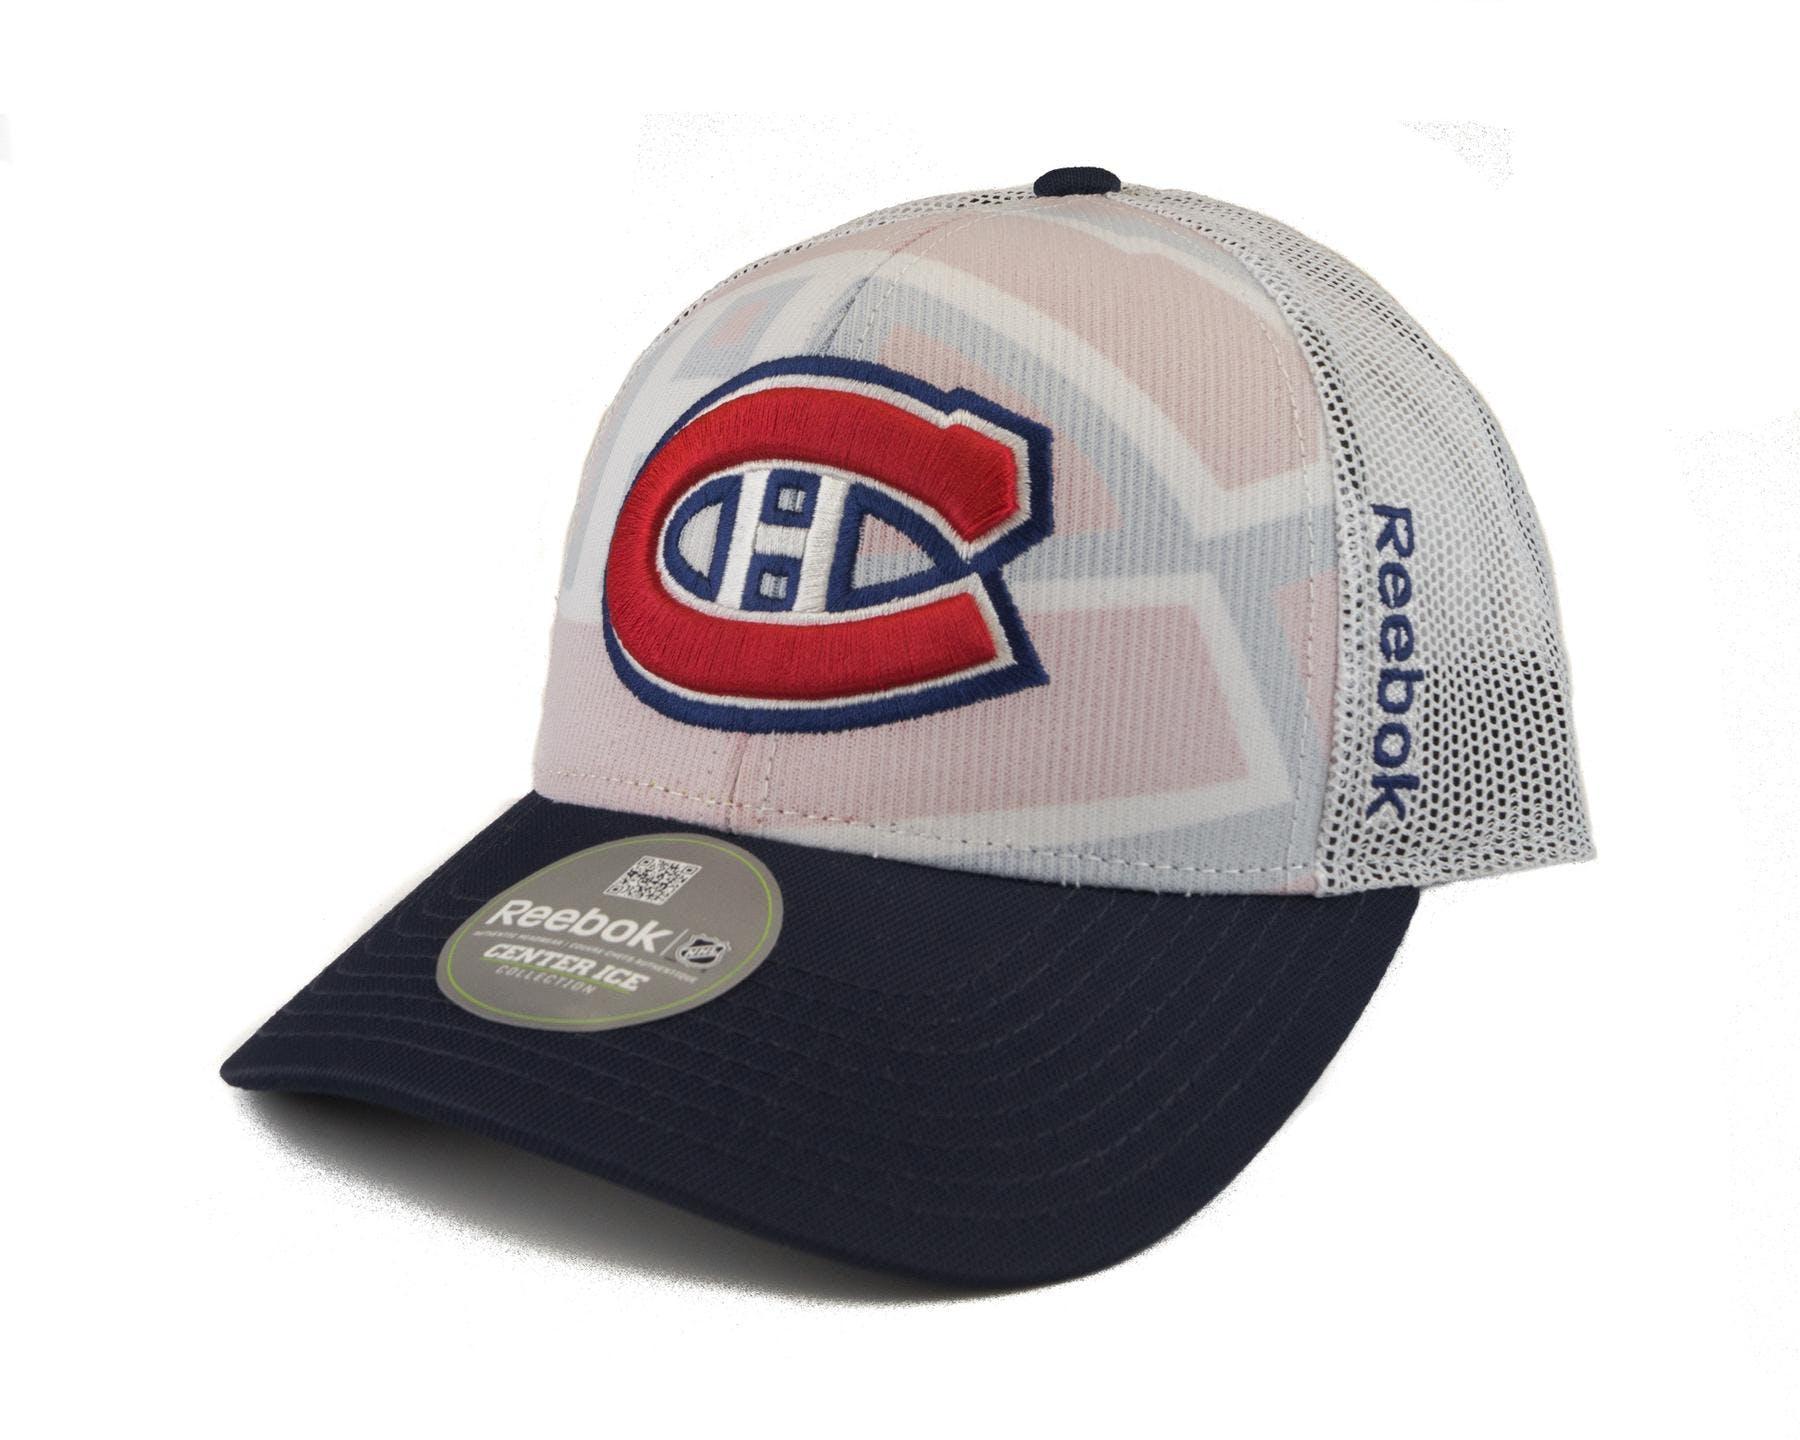 3812af909f8 Montreal Canadiens Reebok White Draft Cap Structured Adjustable Hat